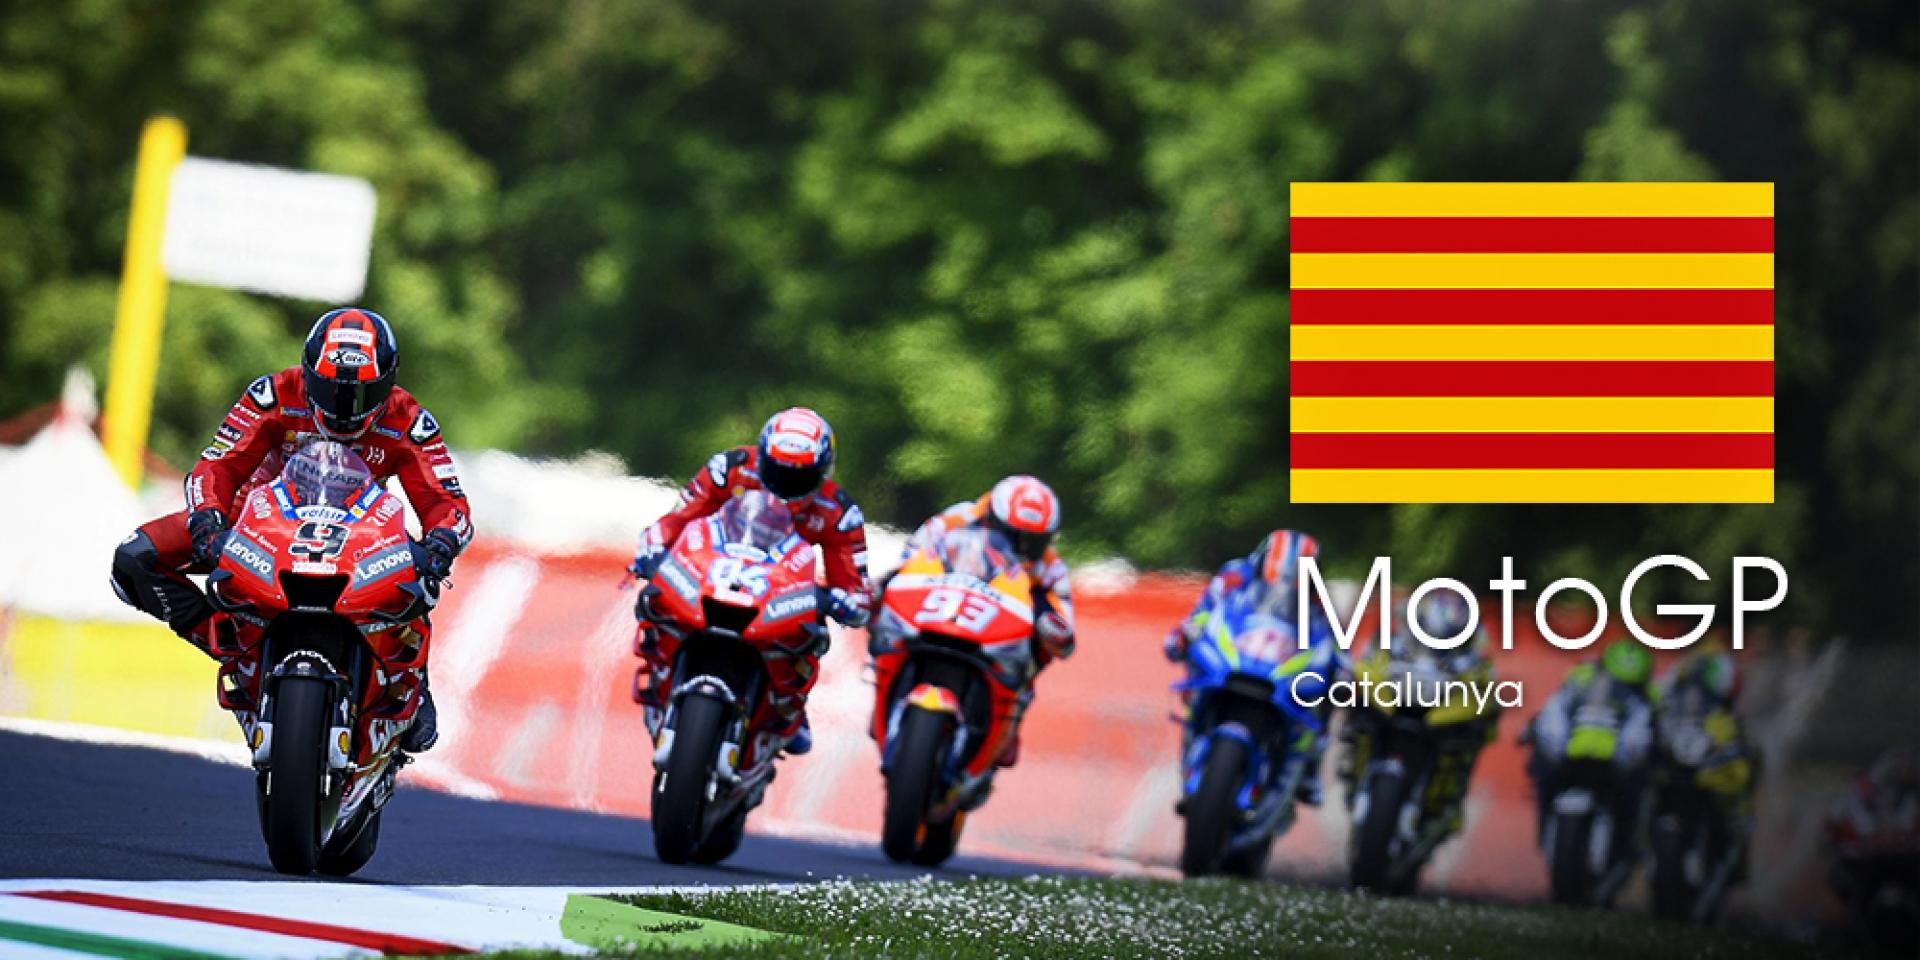 MotoGP 2019 加泰隆尼亞站 轉播時間   SUPERMOTO8